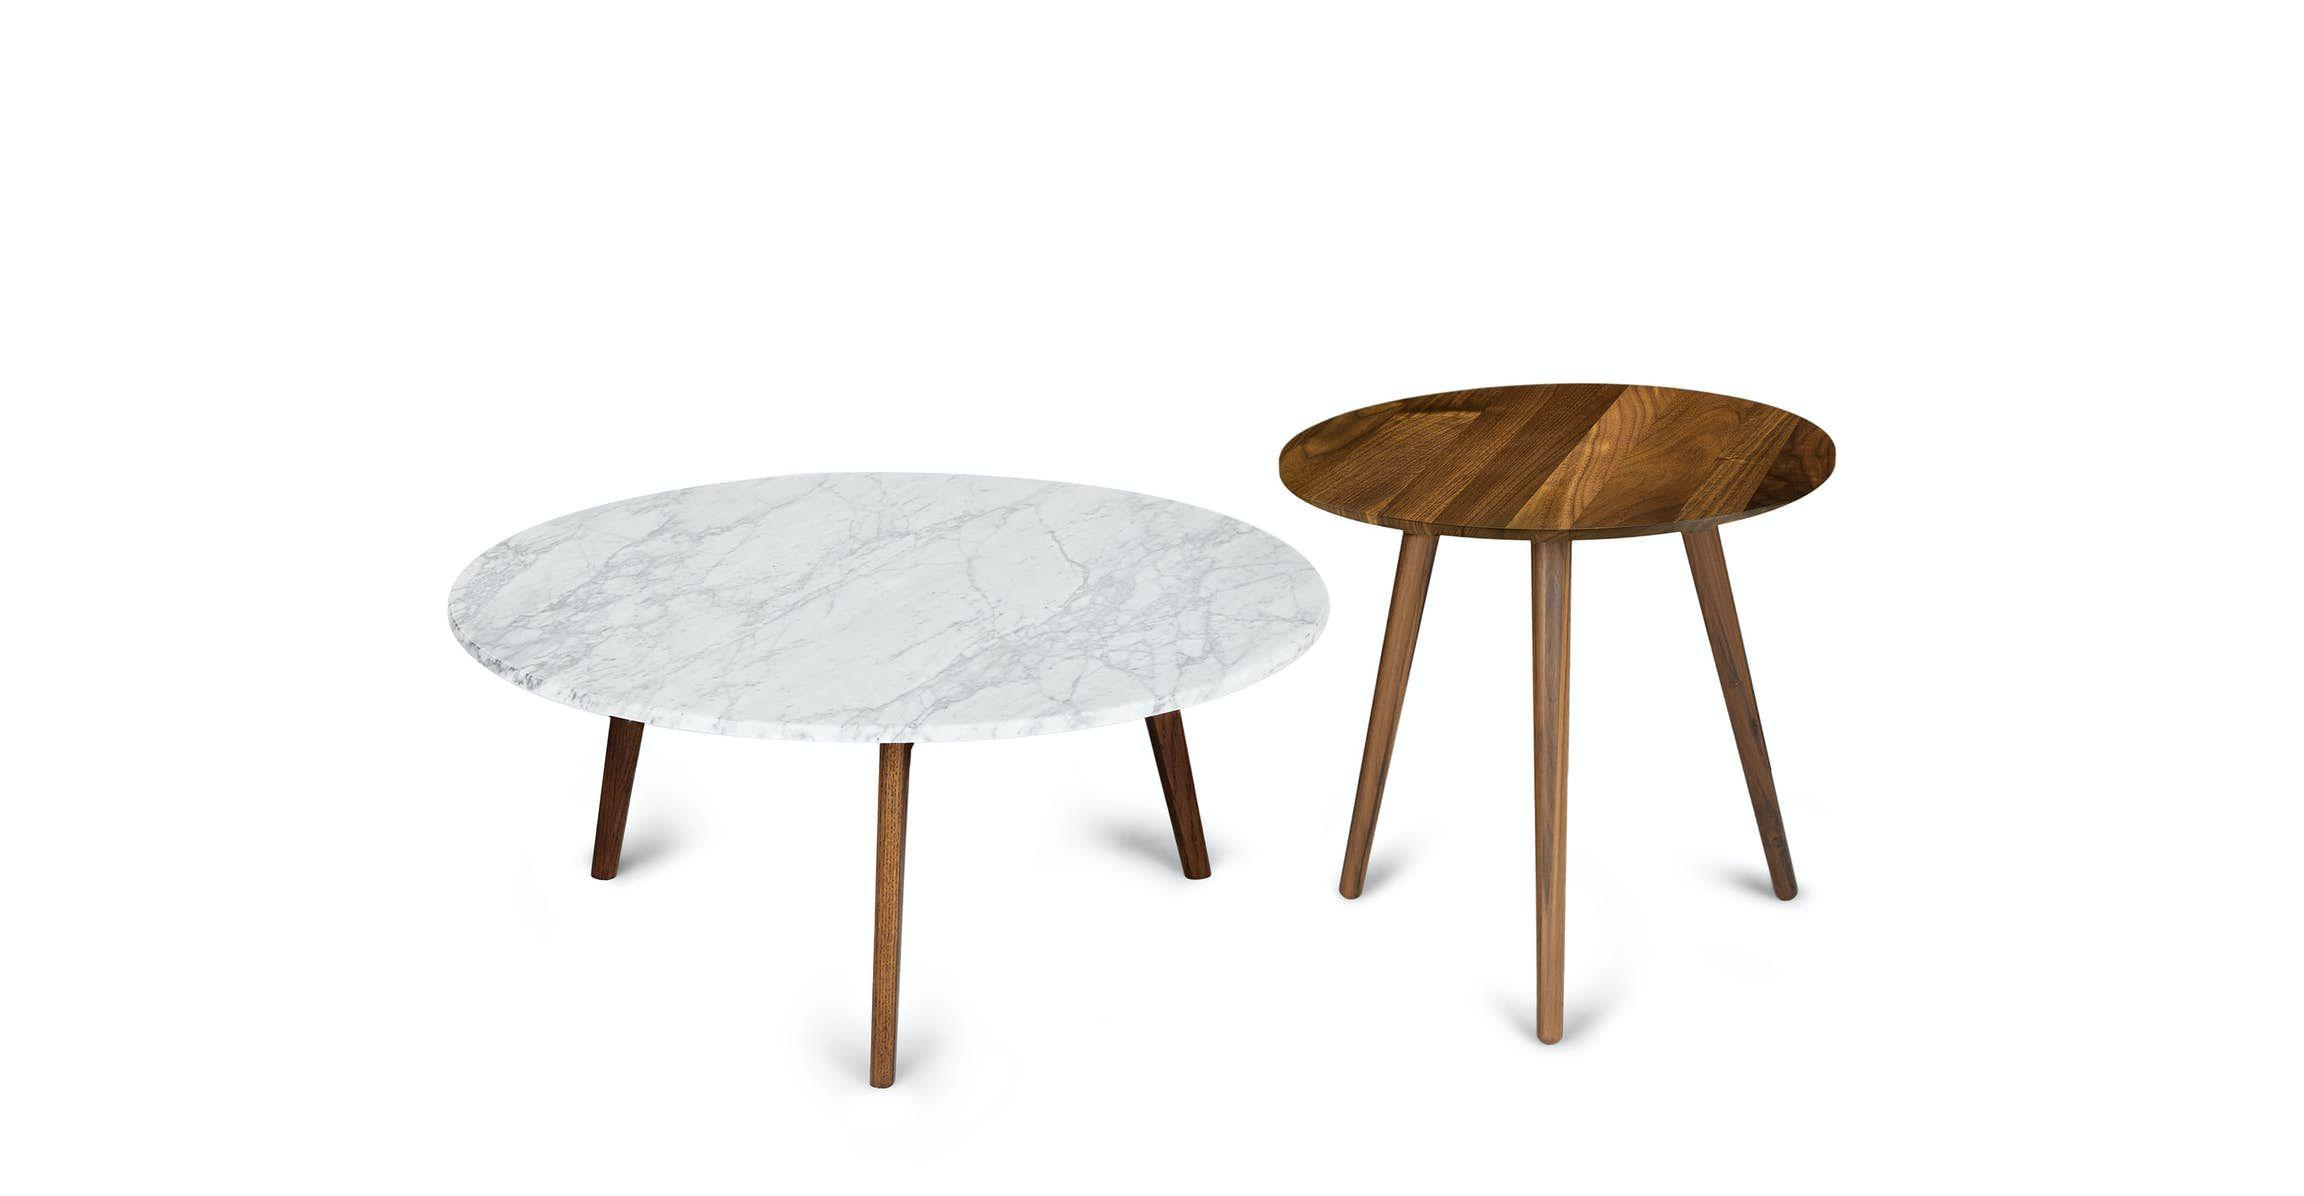 Mara Walnut Coffee Table In 2021 Mid Century Modern Coffee Table Coffee Table Walnut Side Tables [ 1196 x 2304 Pixel ]